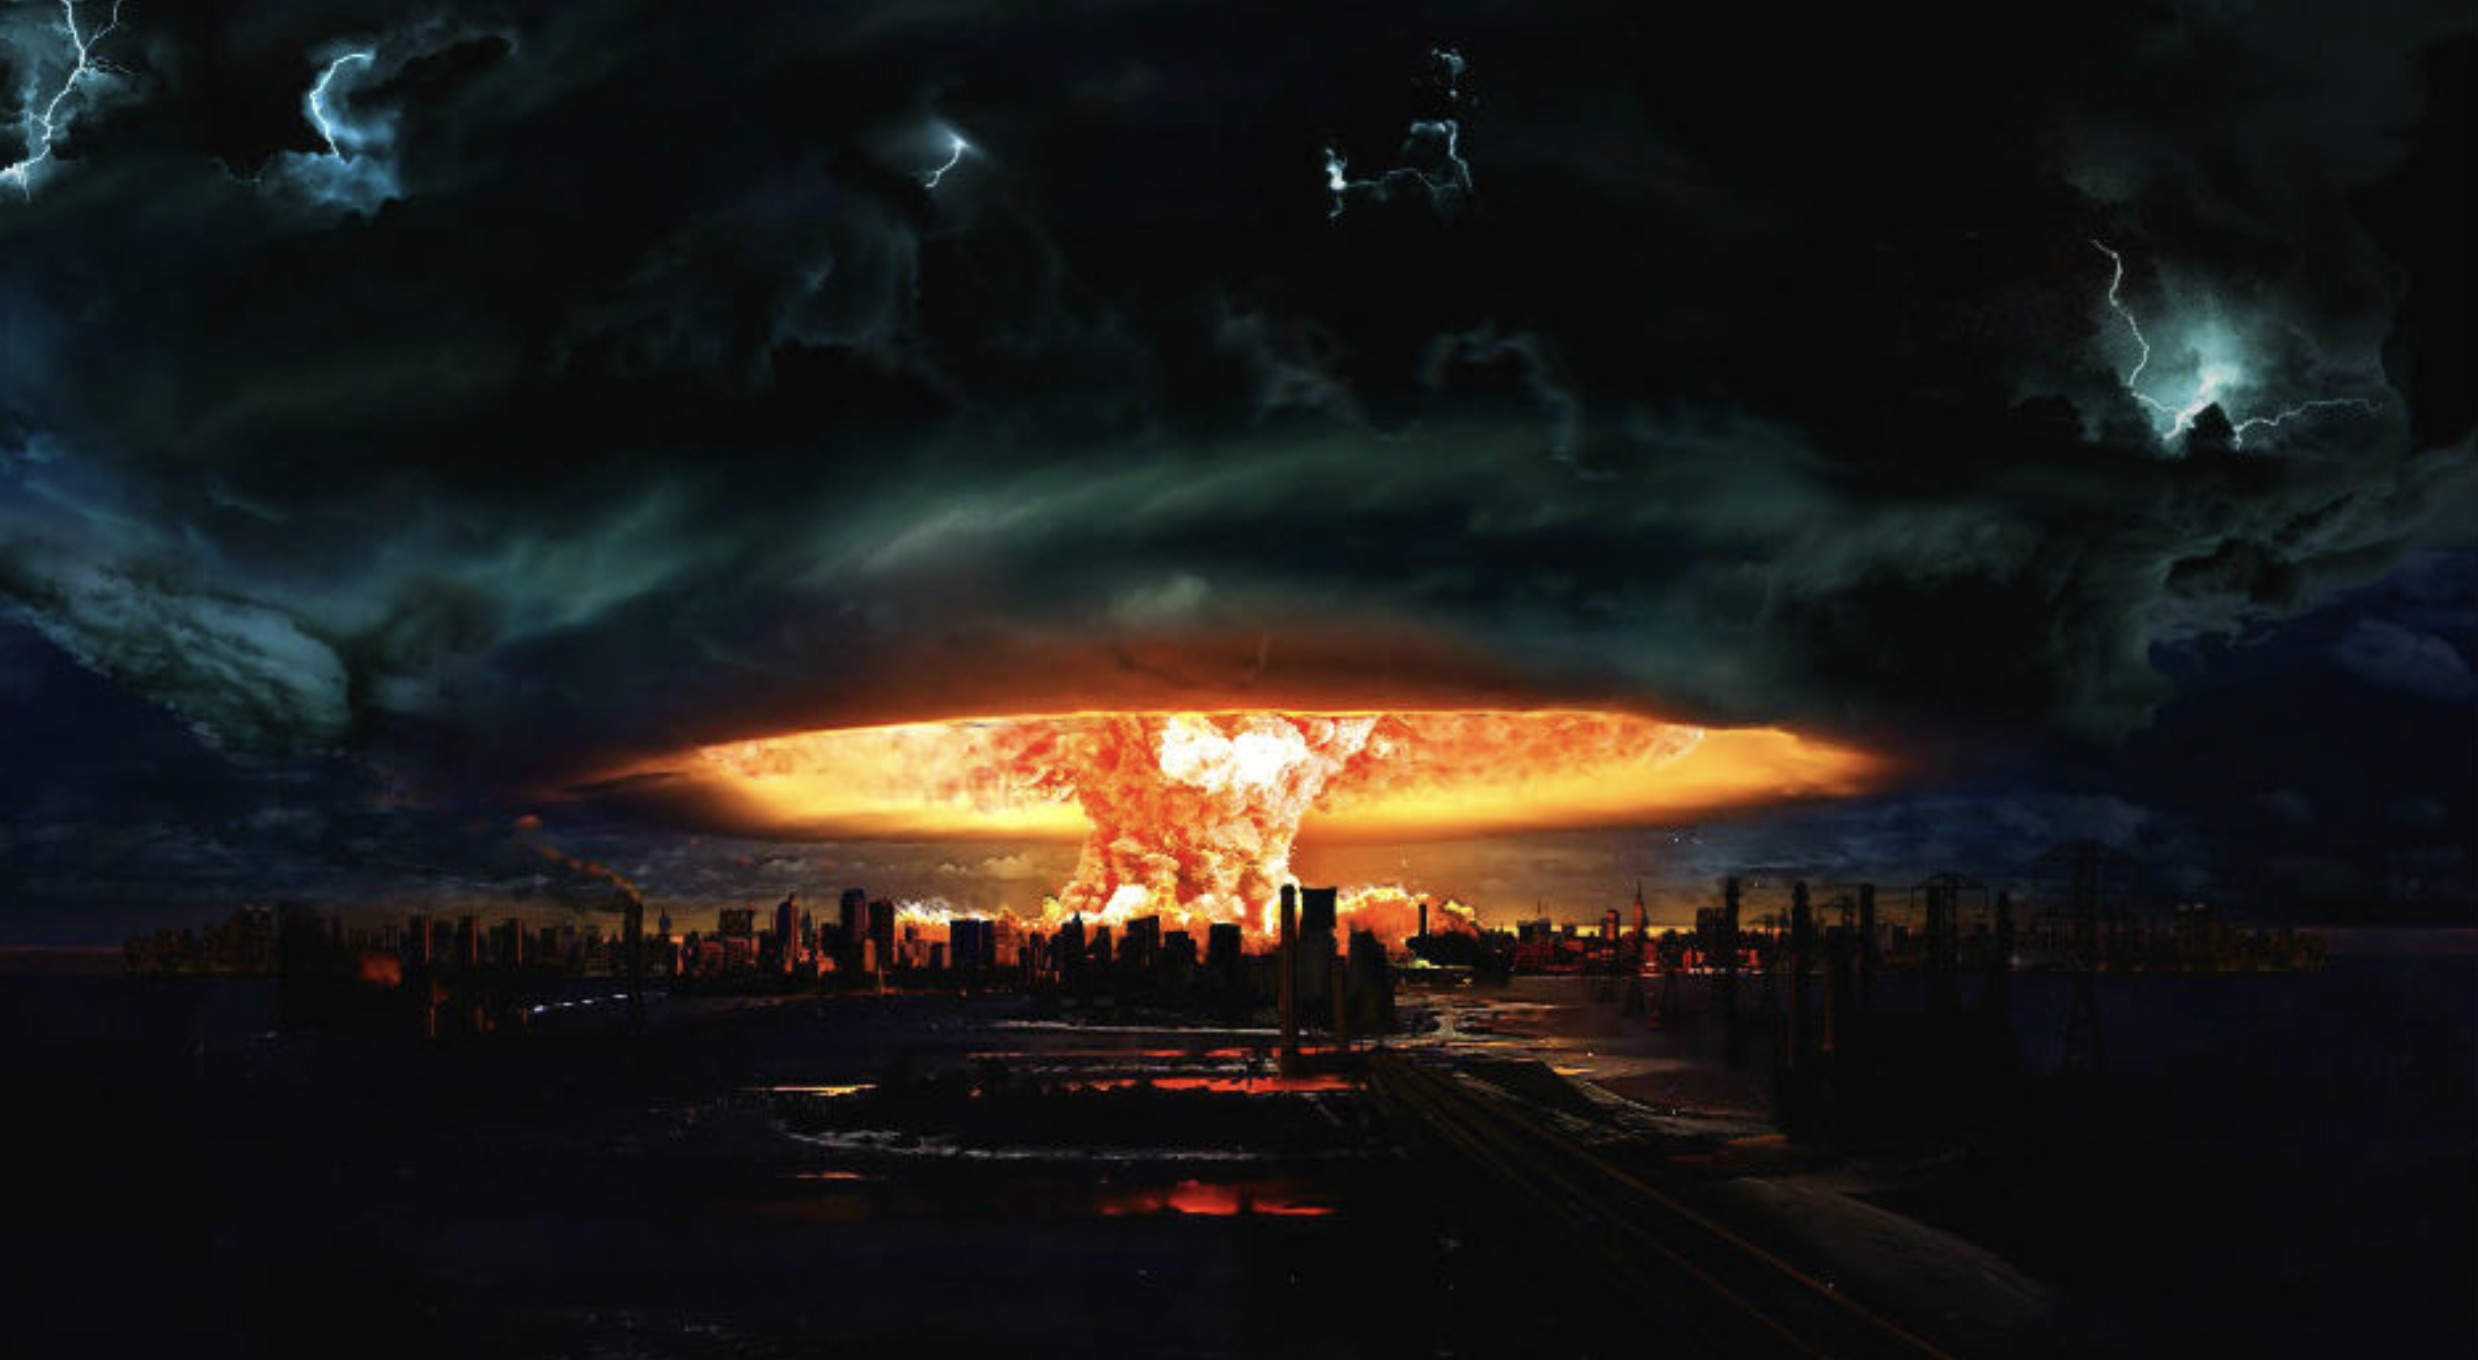 king-world-news-multi-billion-dollar-fund-managers-doomsday-prediction-sends-shockwaves-across-the-internet